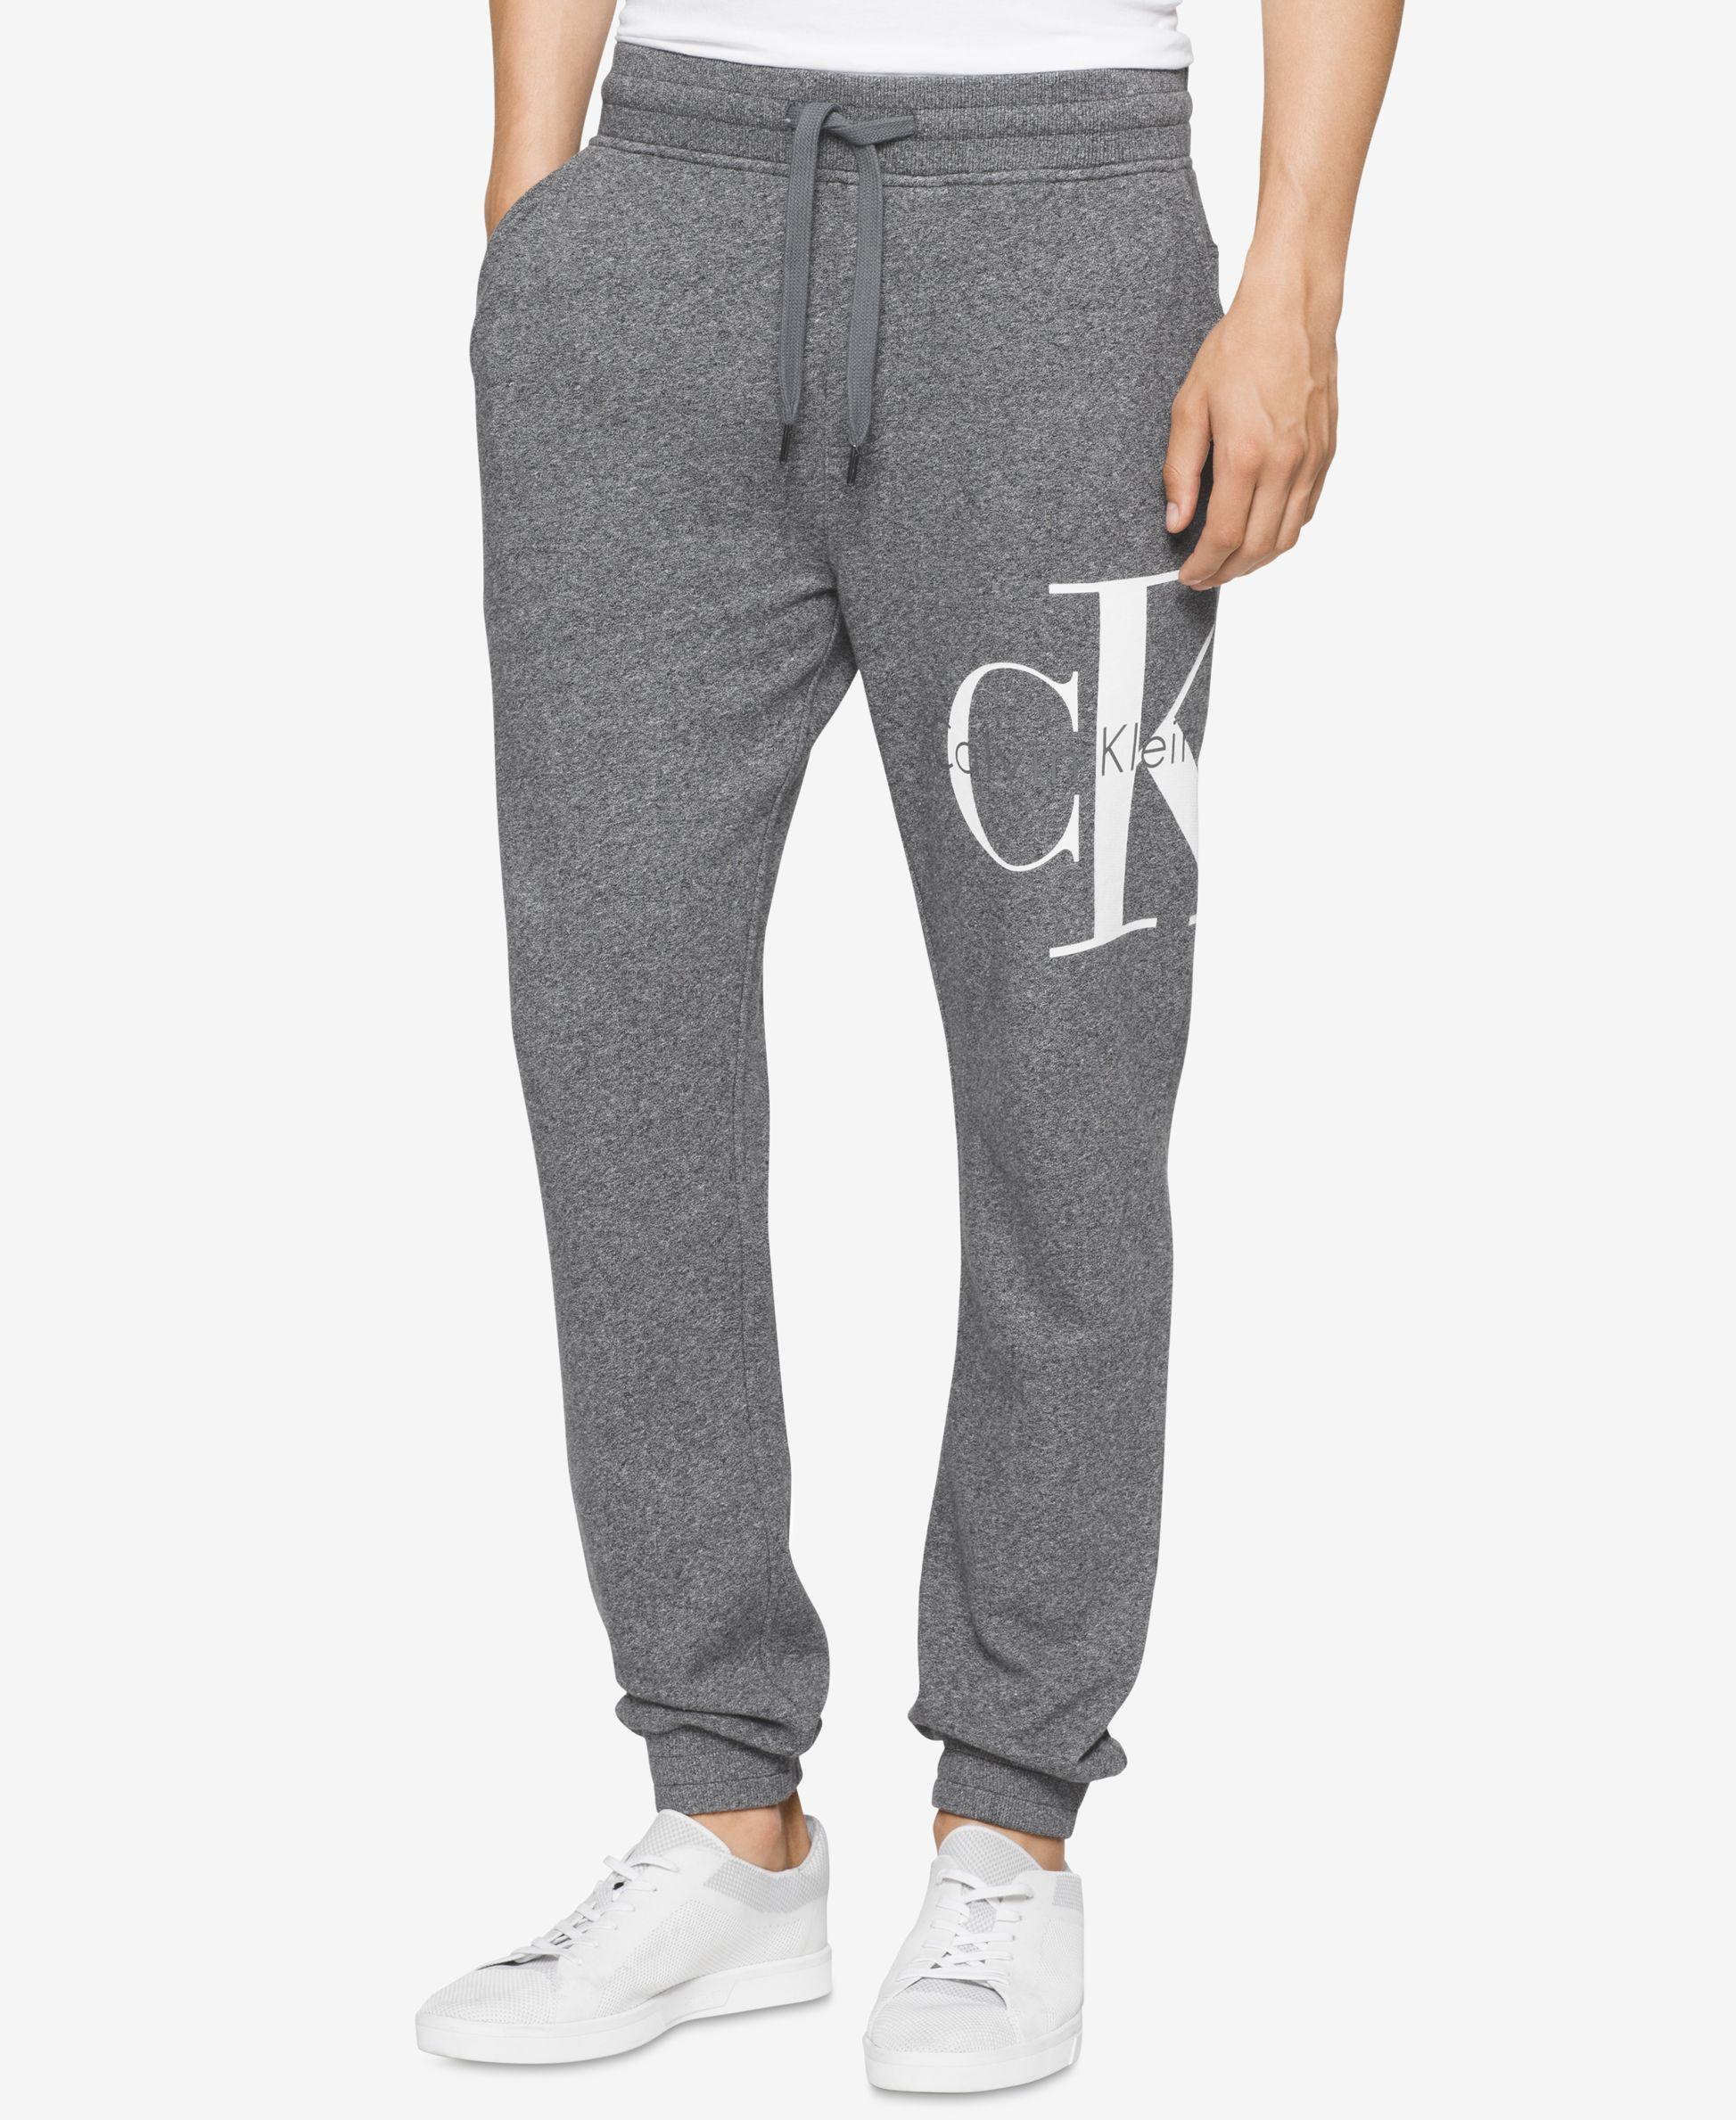 bfffbff108eb Calvin Klein Jeans Men s Reissue Graphic-Print Logo Joggers